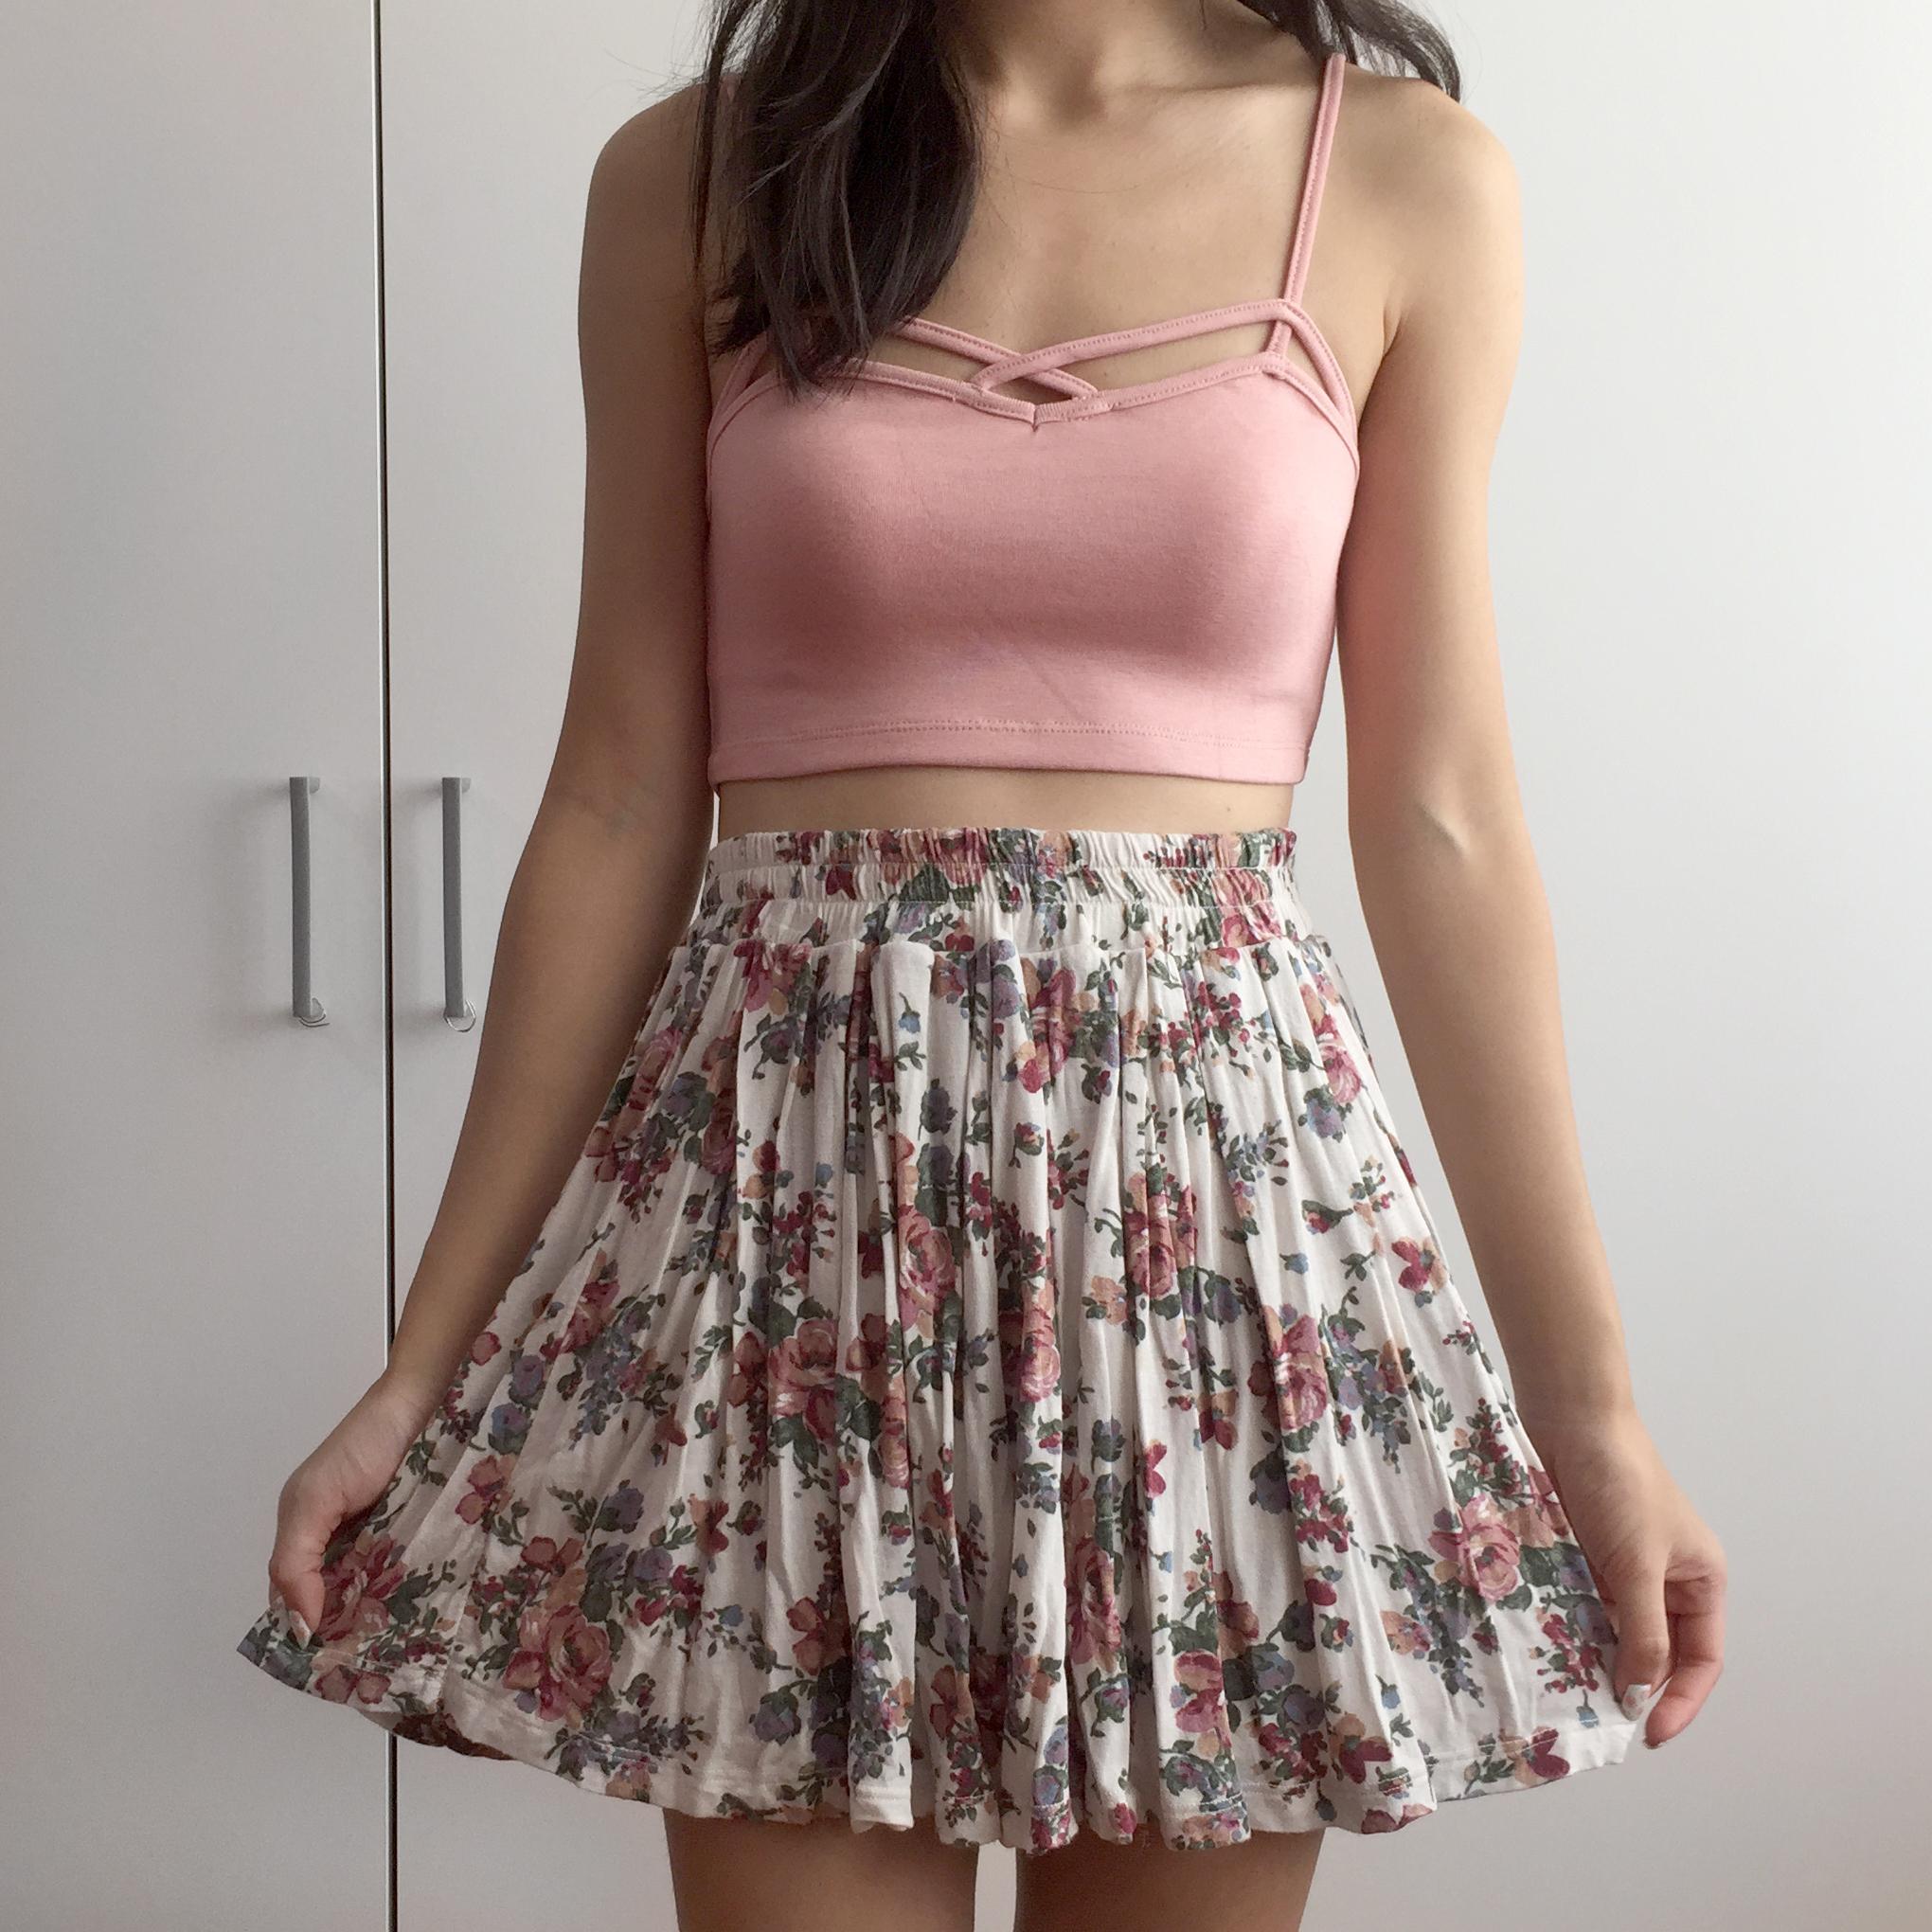 7726e7fac0bfa Strappy Cross Front Bralette (Blush Pink) · Megoosta Fashion · Free ...